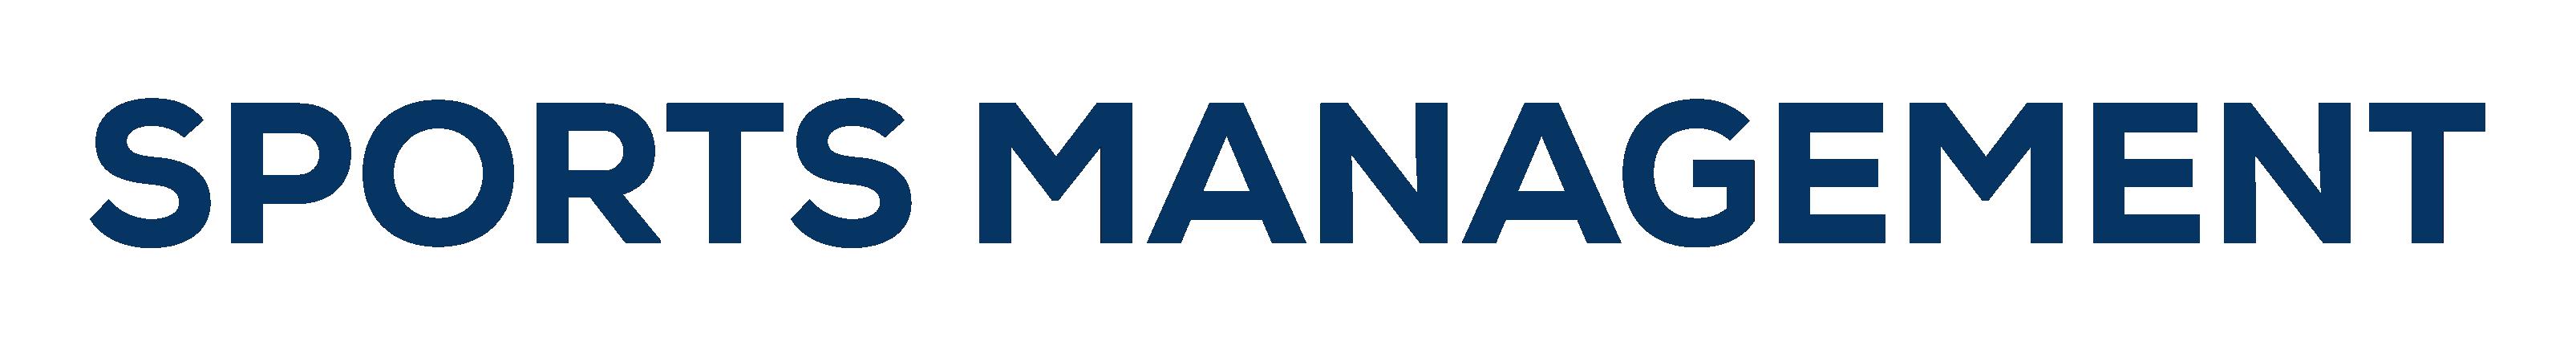 Design a sleek logo for a new sports agency